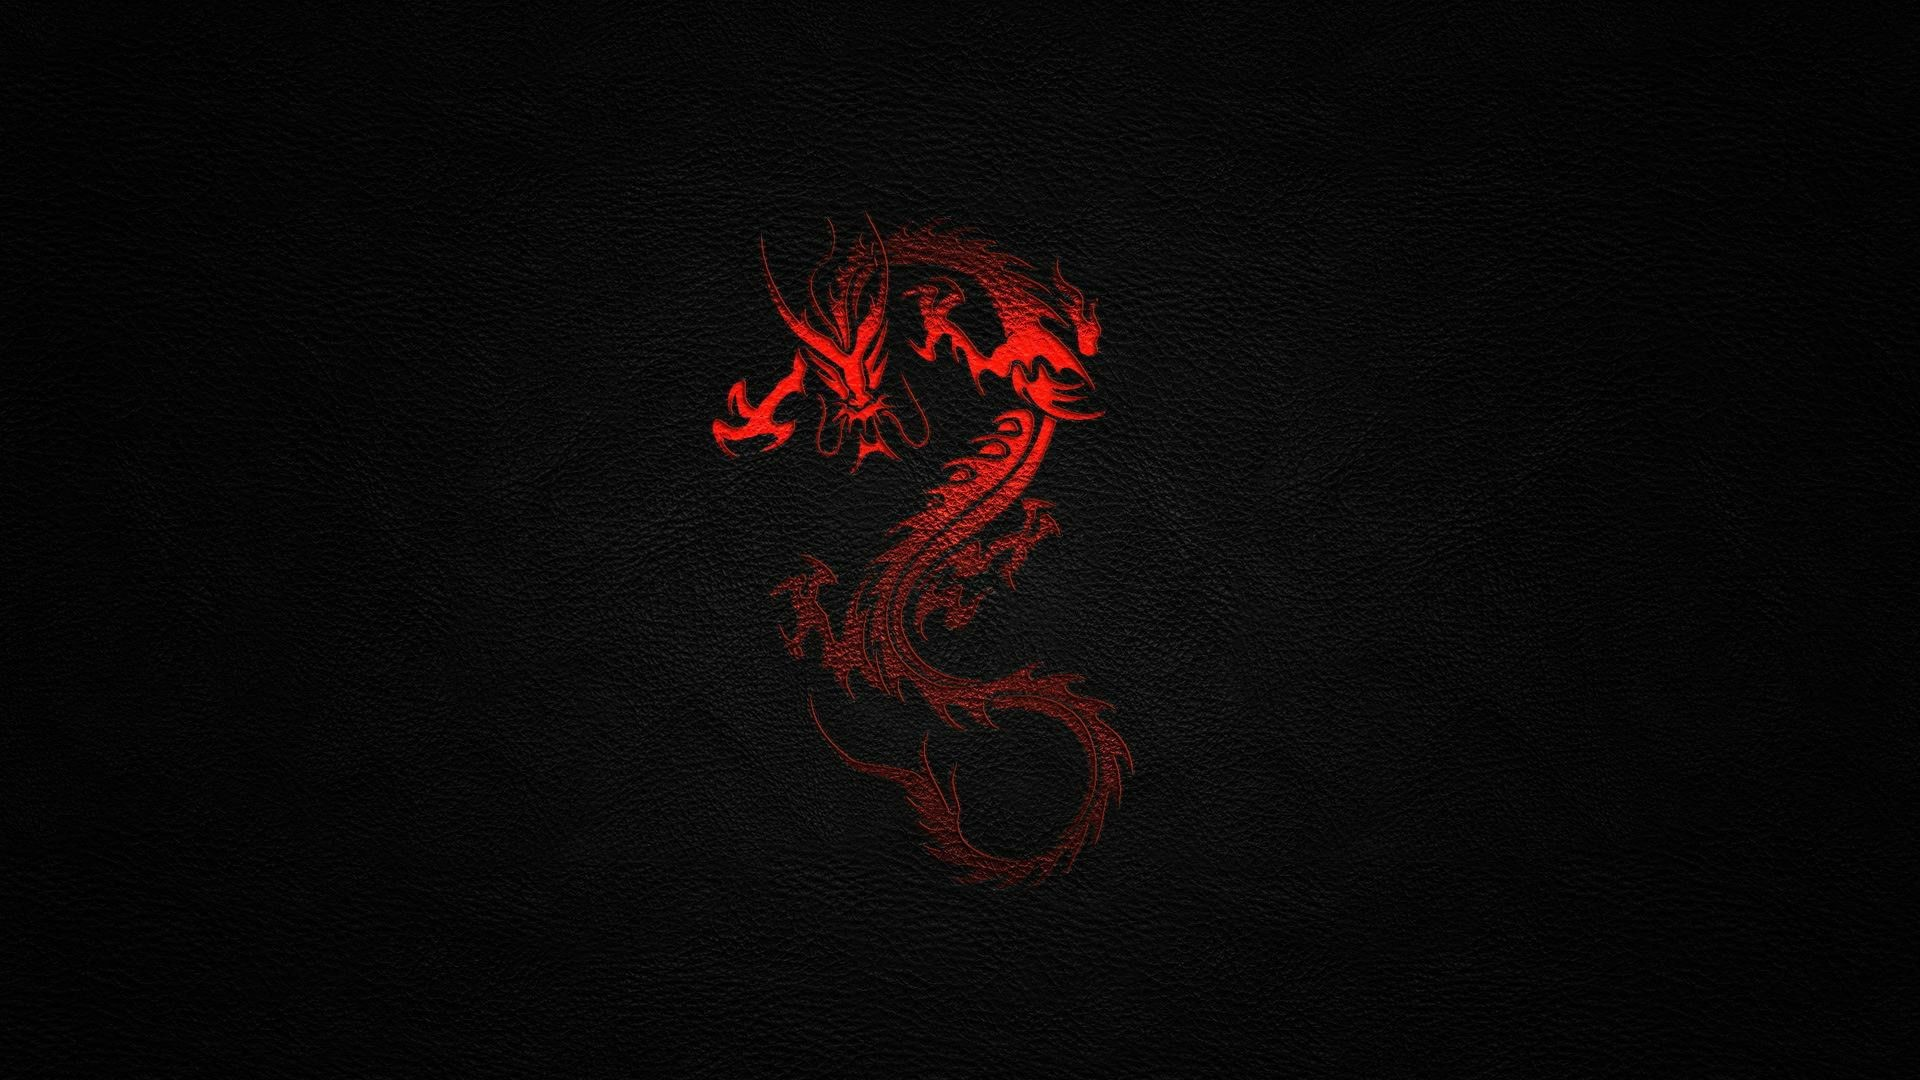 Black red dragon desktop wallpaper